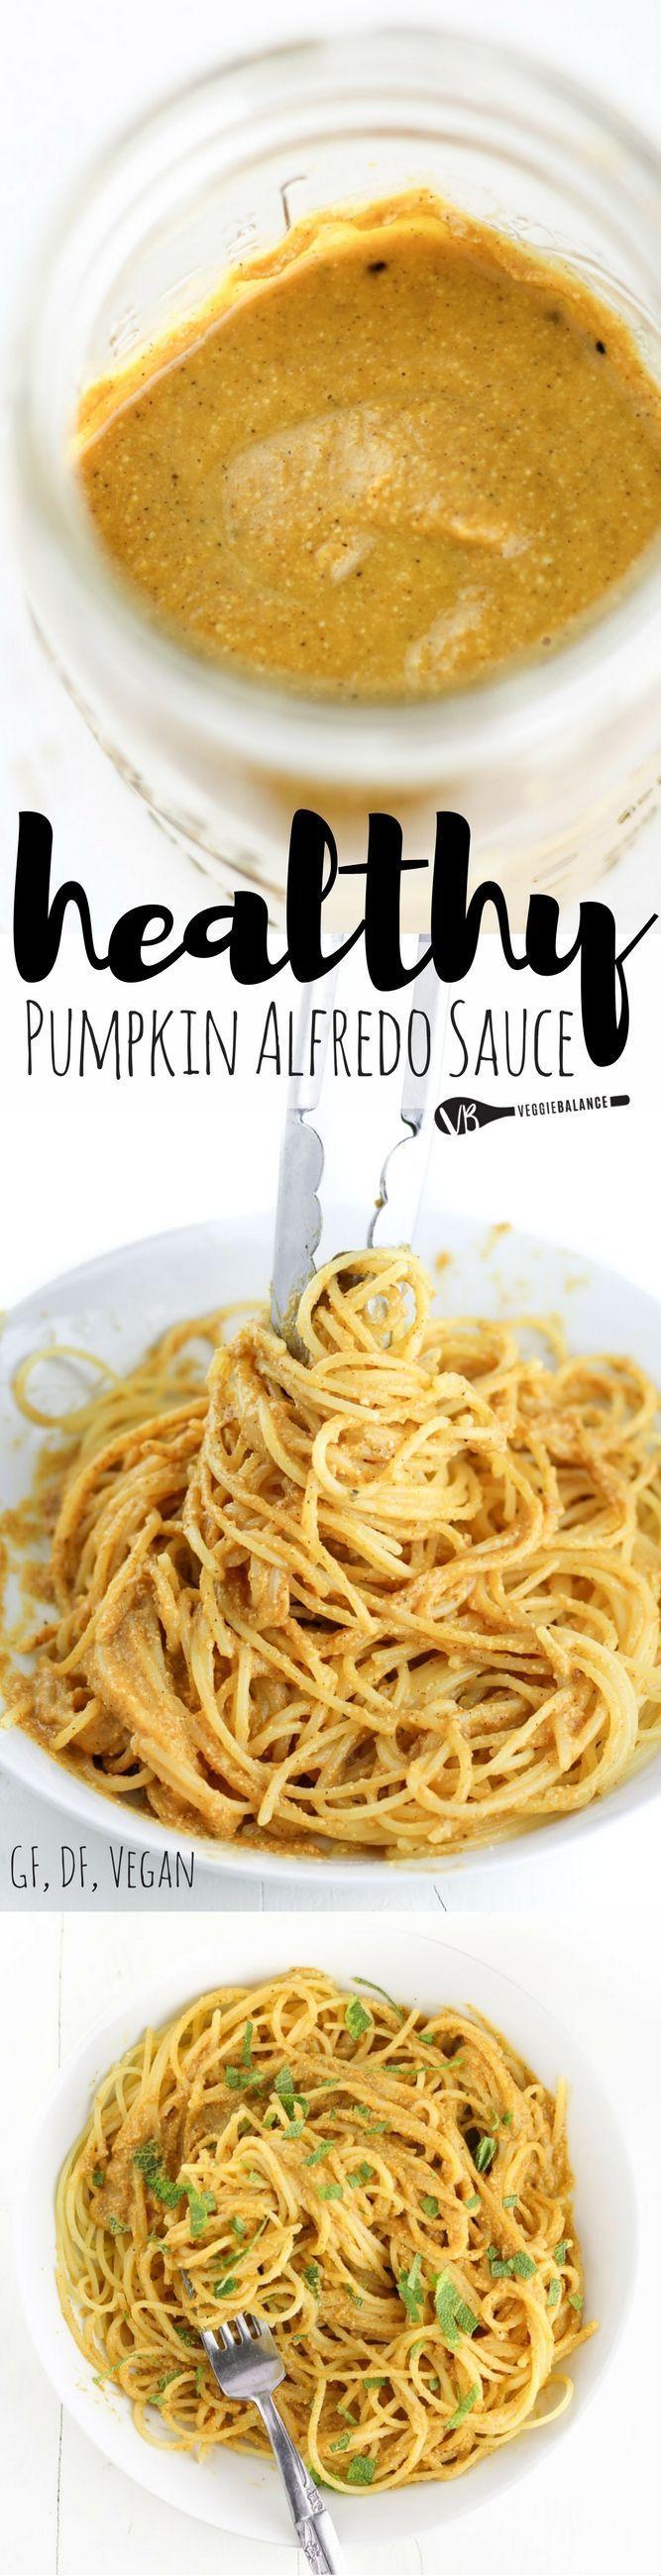 Egan Pumpkin Alfredo Sauce Recipe Made With 9 Ingredients